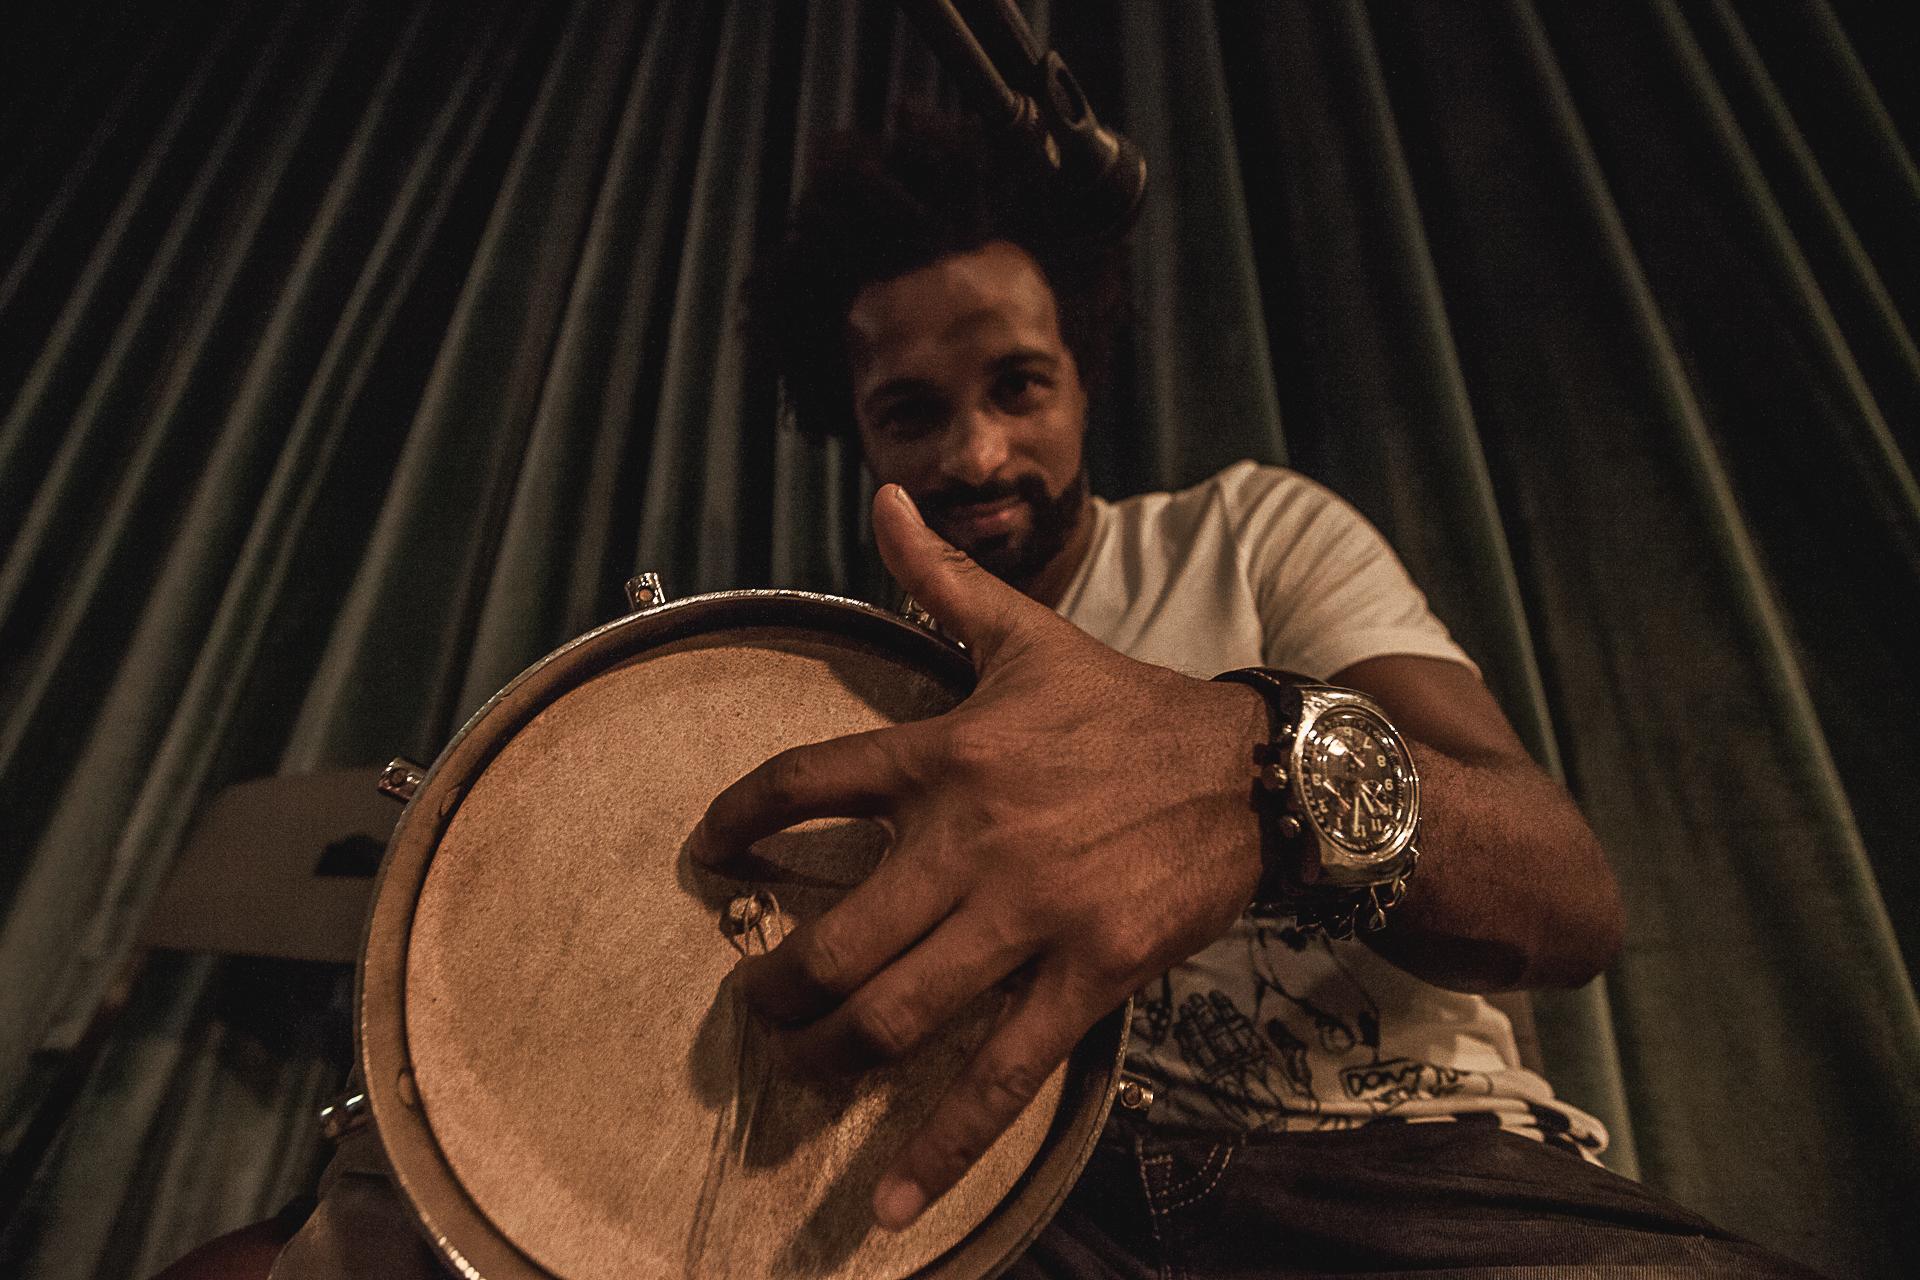 Quintal do Samba Rua Concert On Stage Photography Fotografia bonjourmolotov Andre Gigante 02